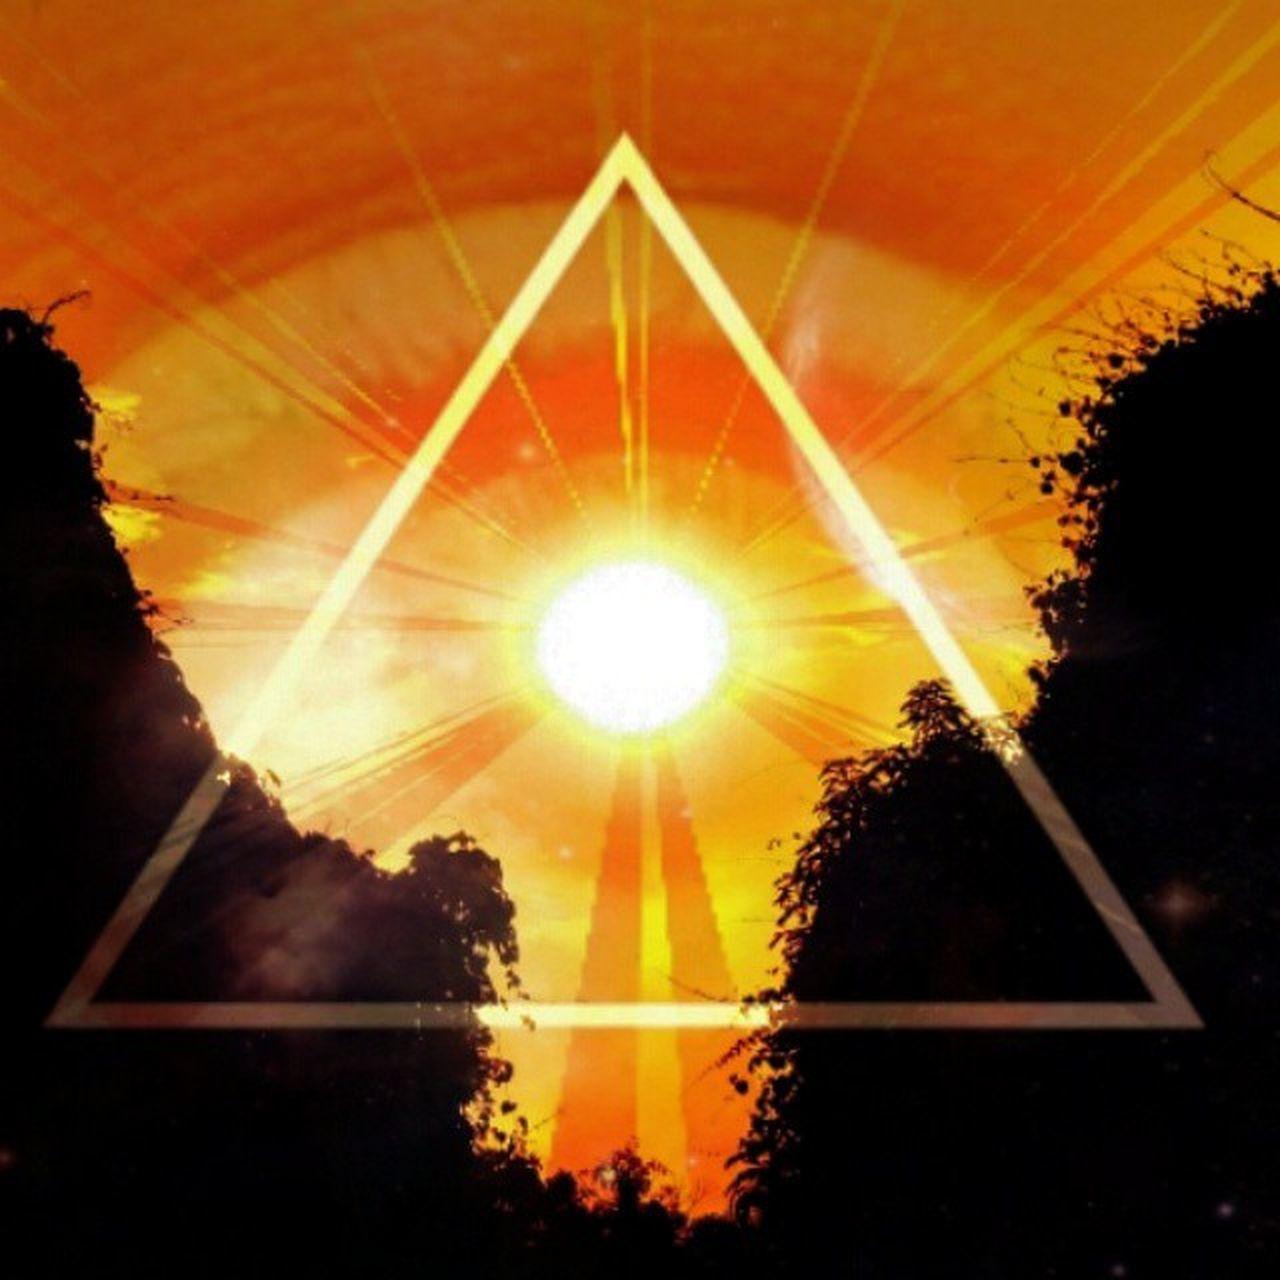 illuminated Tags : ➡ Skyfell Pixlr Triangle sunset illuminati allseeingeye cosmicgeometry photoexperiments photoeffects photooftheday